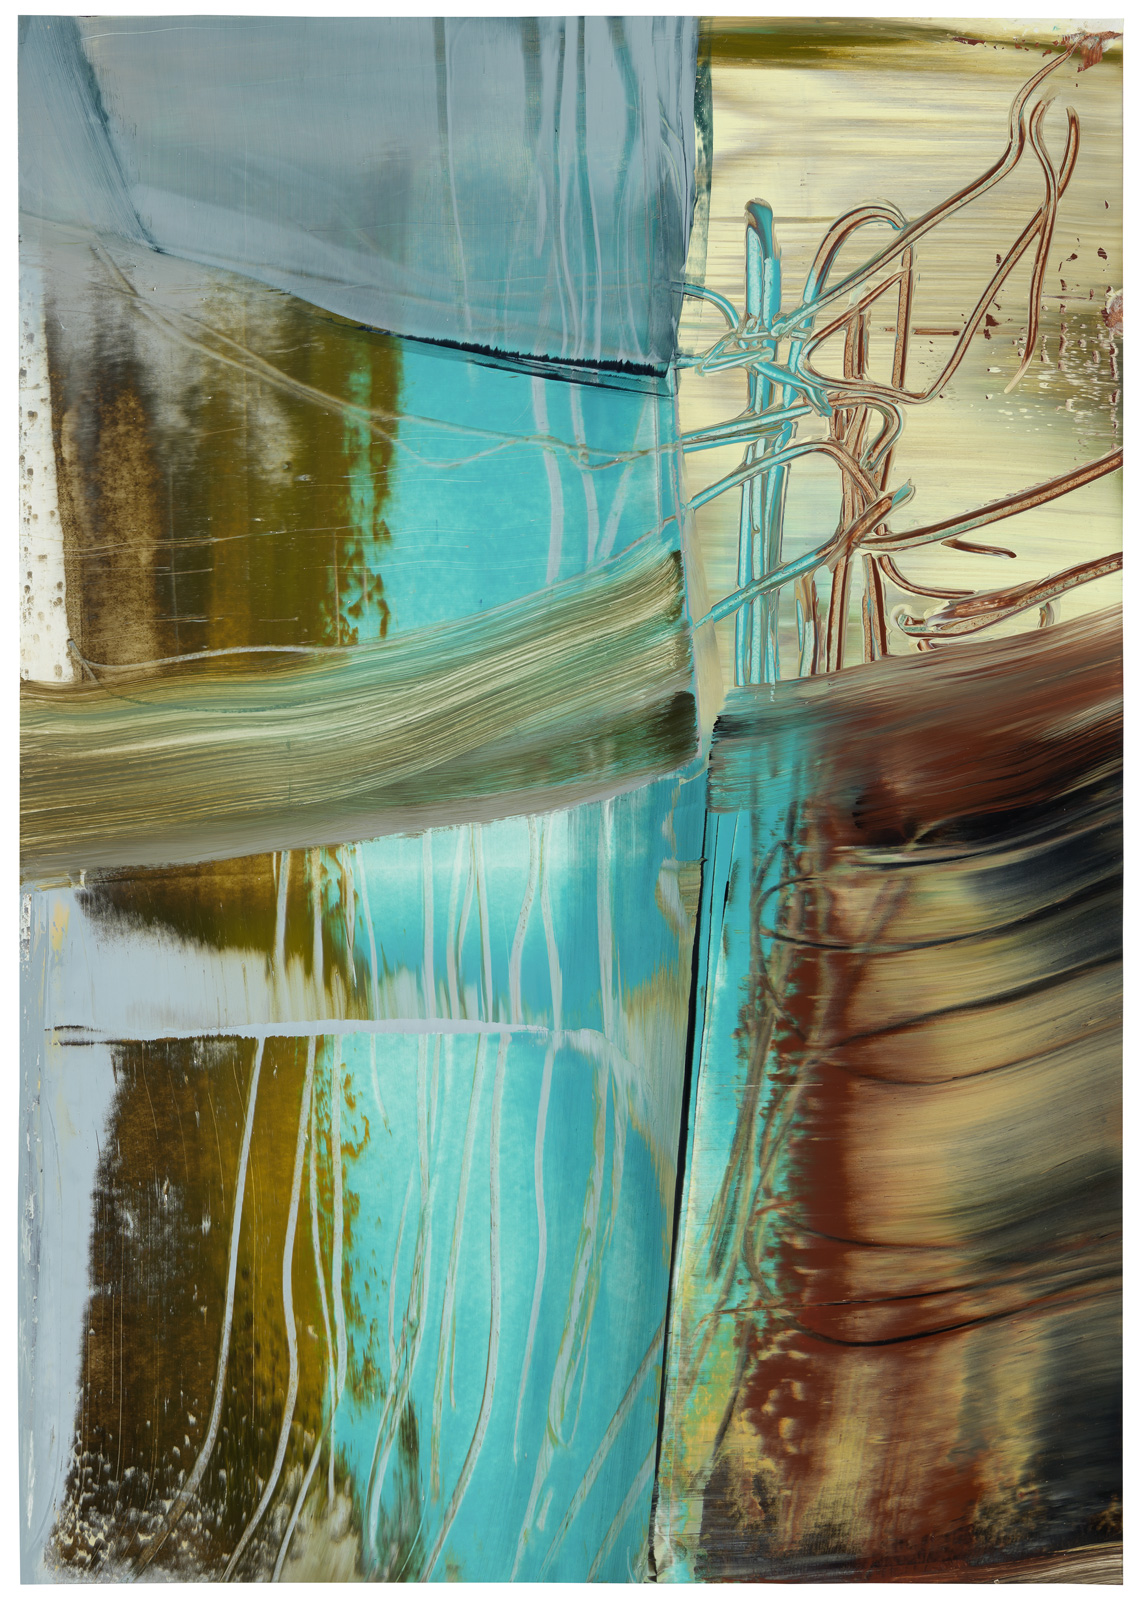 Meares Island, Öl auf Papier, 51x36cm, 2018/19